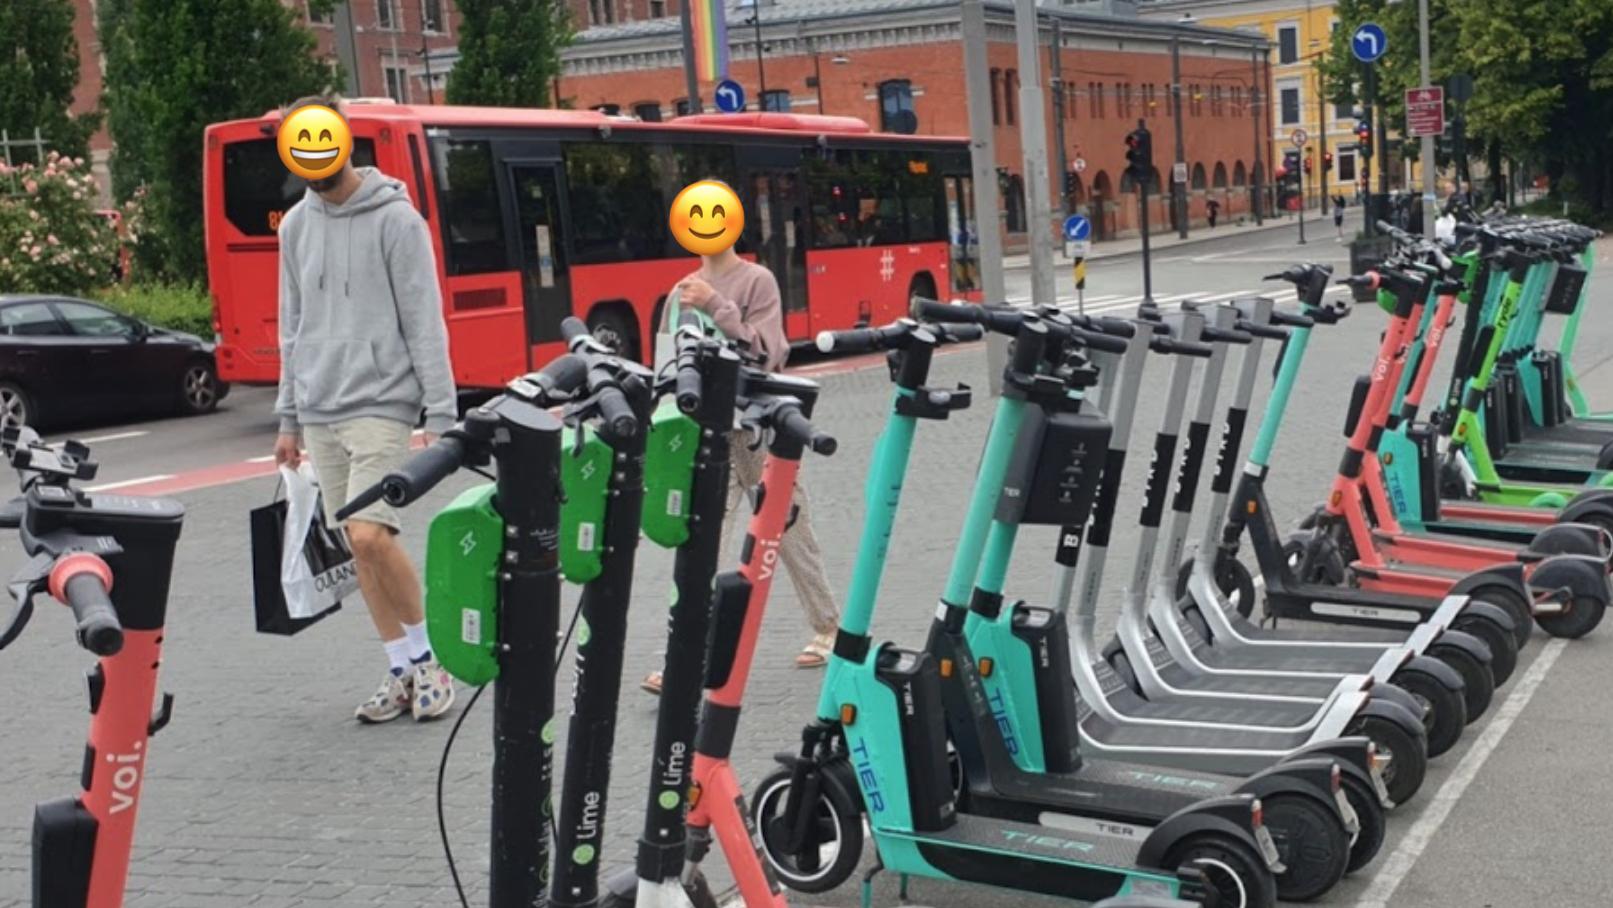 El-sparkesykler i Oslo sentrum